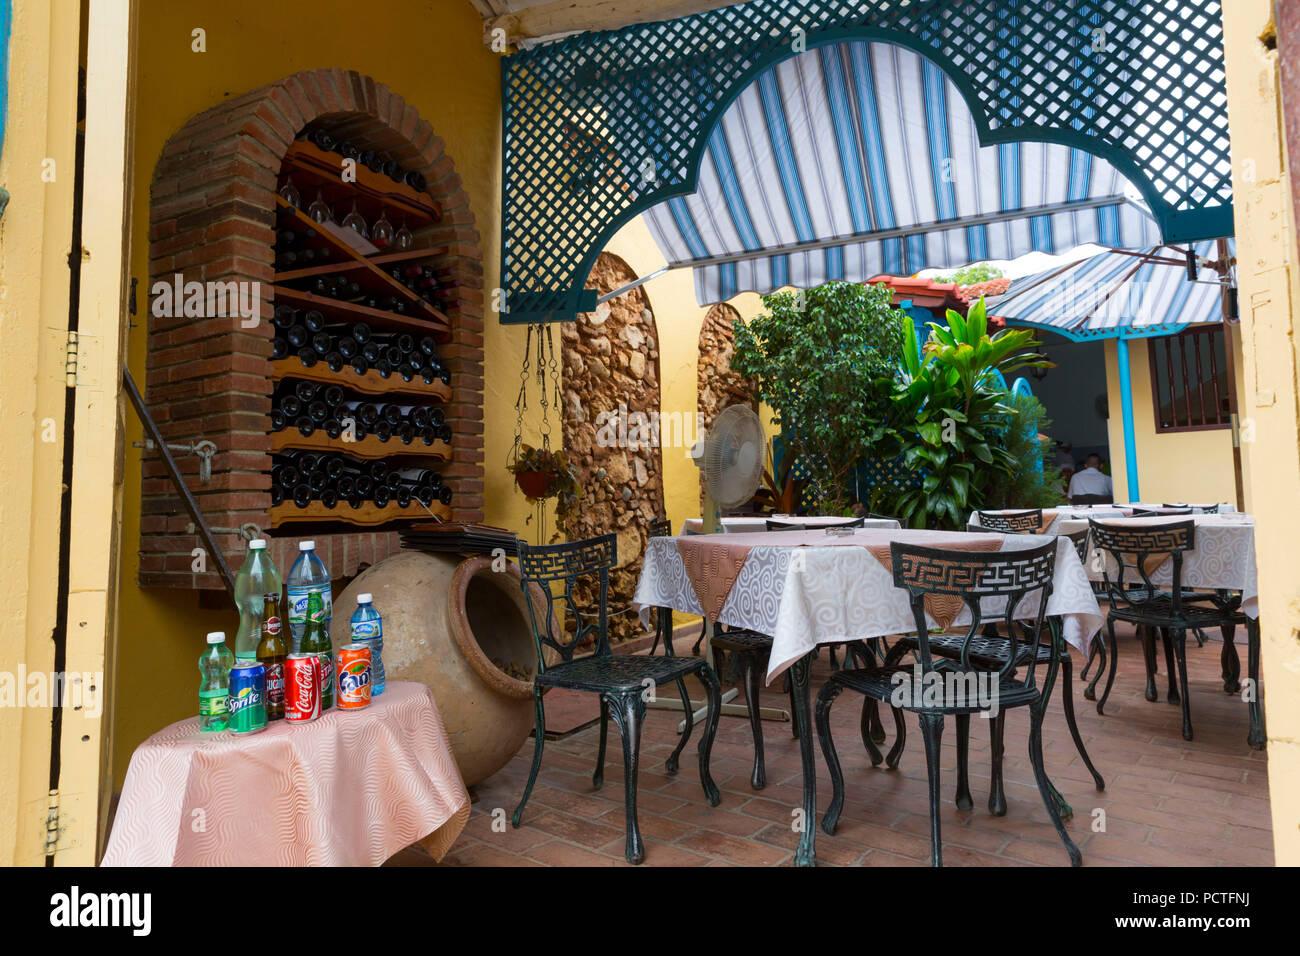 Restaurant Los Conspiradores, Trinidad, Sancti Spiritus Province, Cuba, Republic of Cuba, Greater Antilles, Caribbean Stock Photo